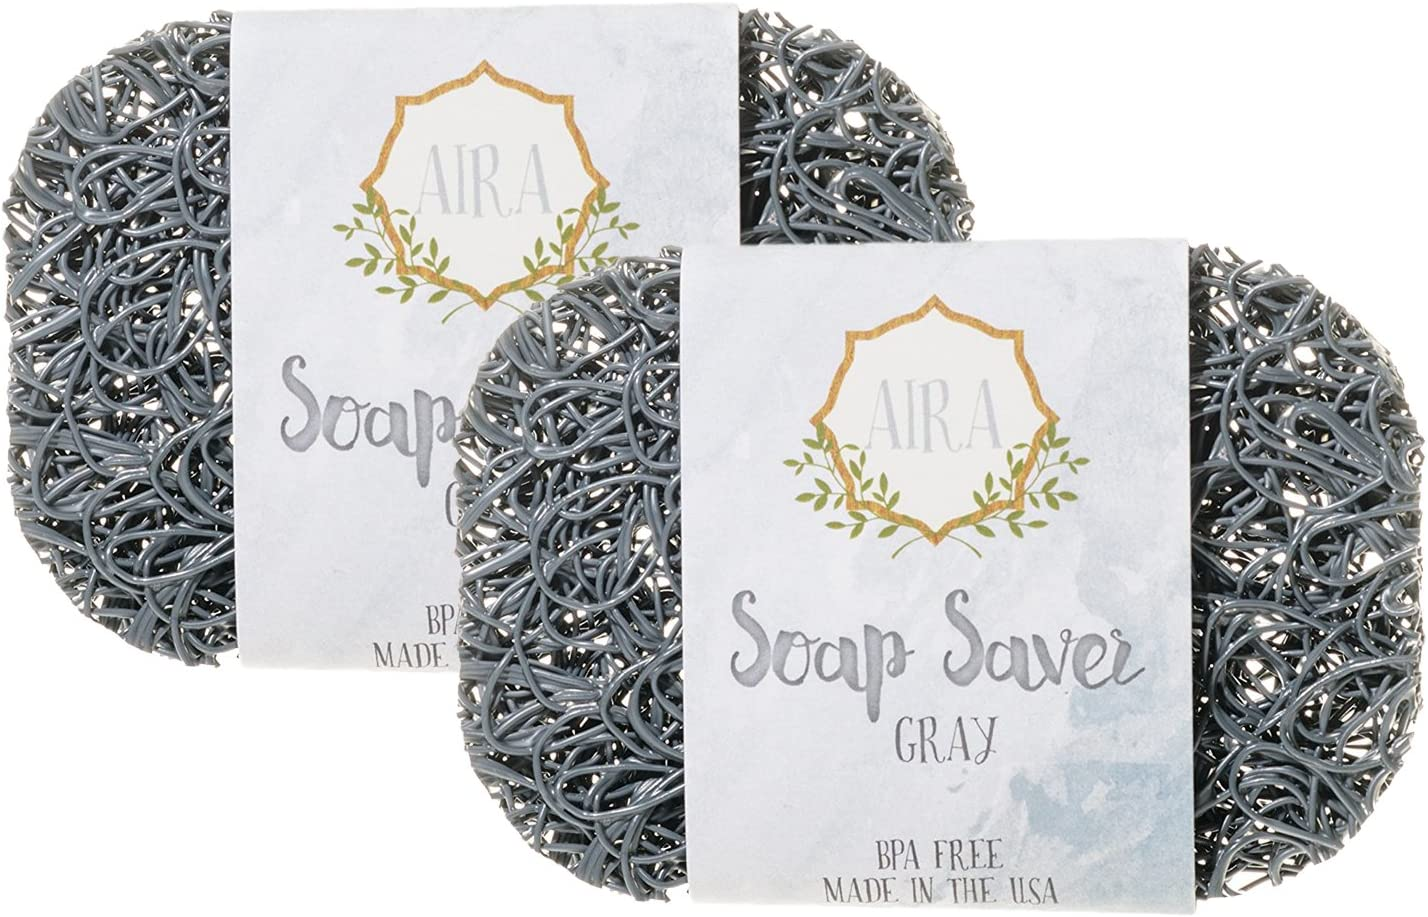 BPA Free Soap Lift Soap Dish Holder Tray Bathroom Many Colors! Aira Soap Saver